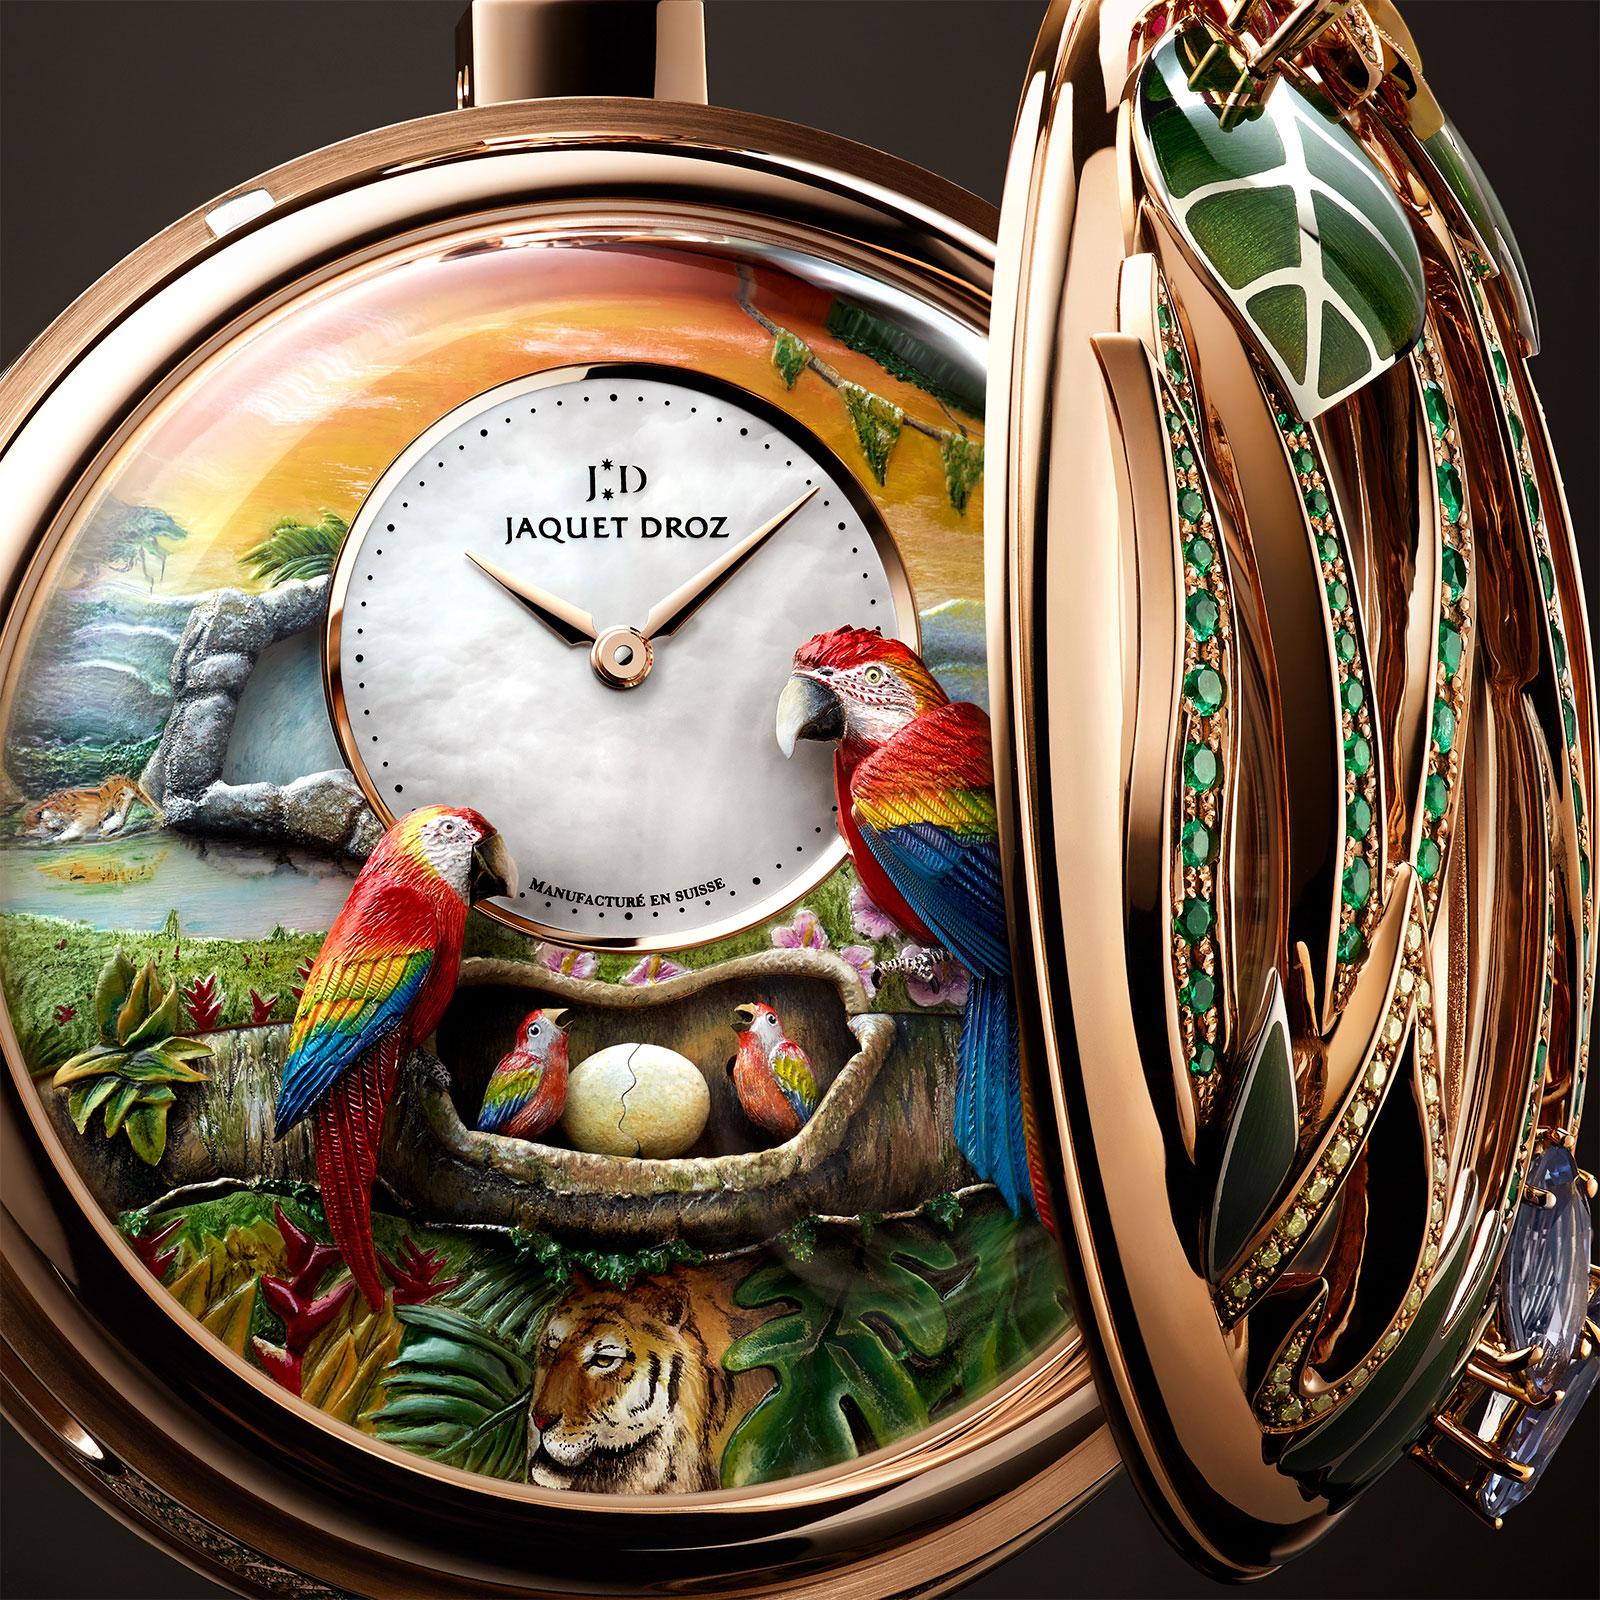 Jaquet-Droz-Parrot-Repeater-Pocket-Watch-7